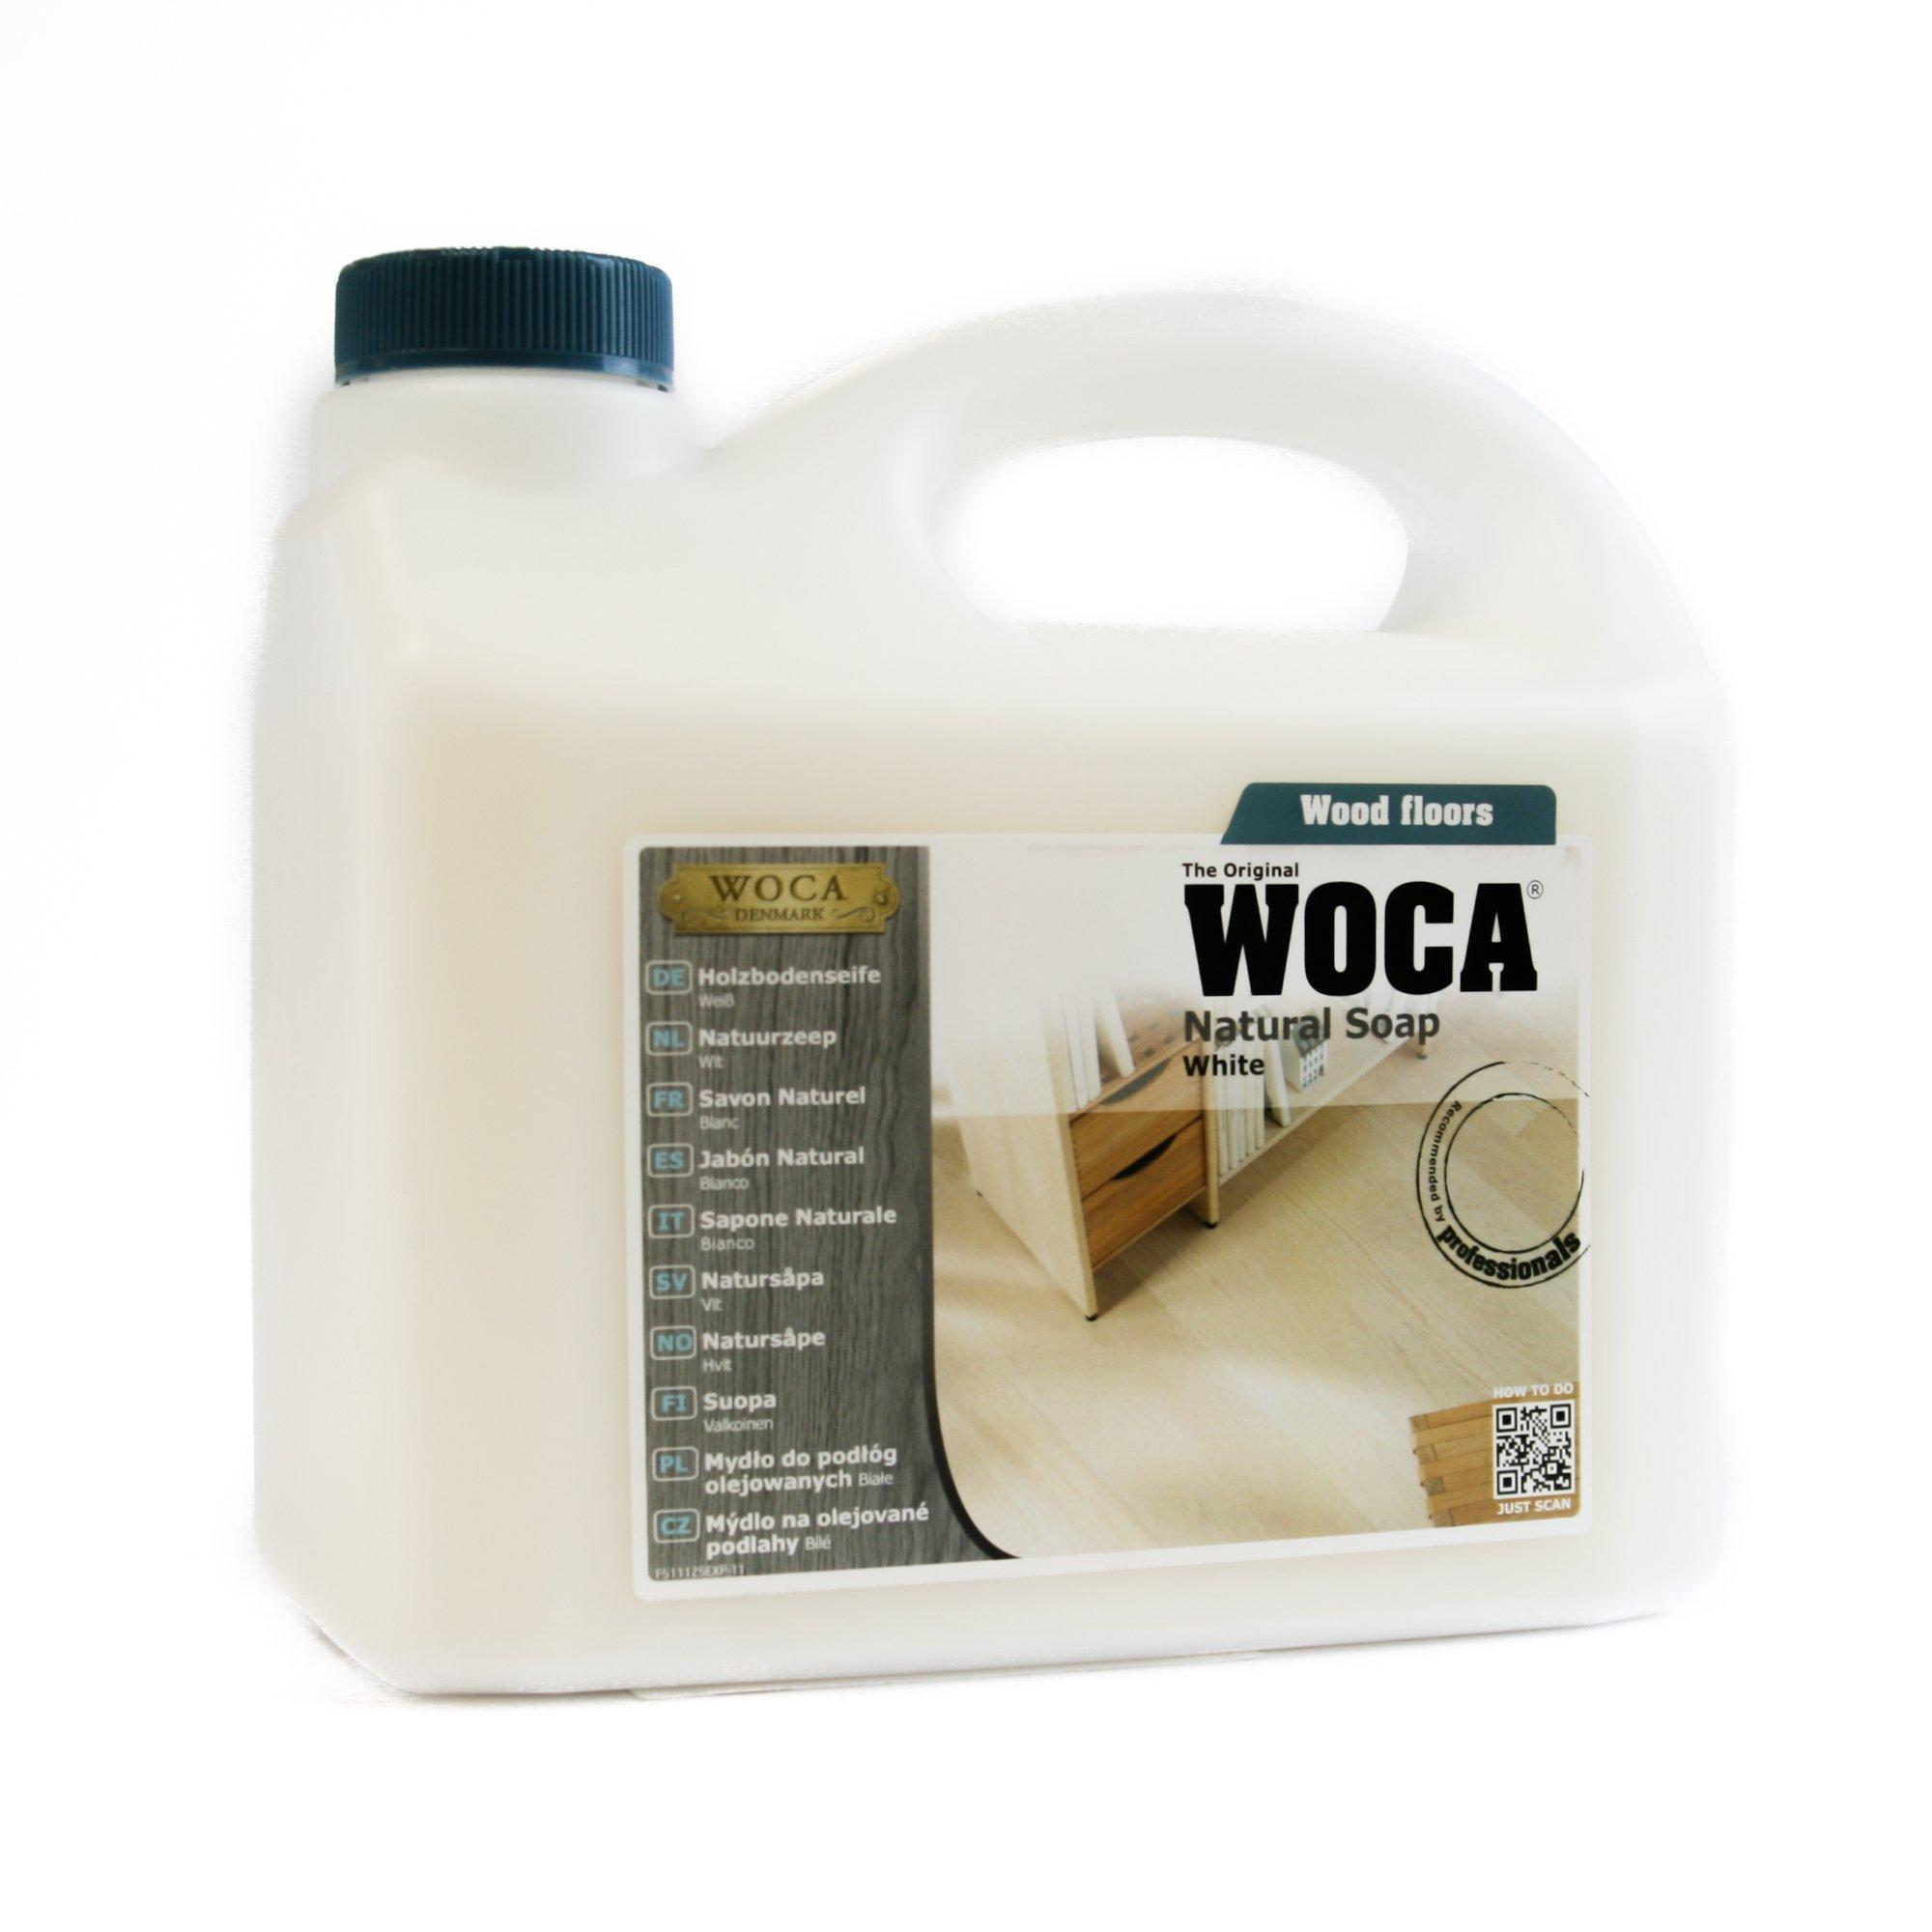 Woca Dennmark Natural Soap White 2.5 liters by Woca Denmark